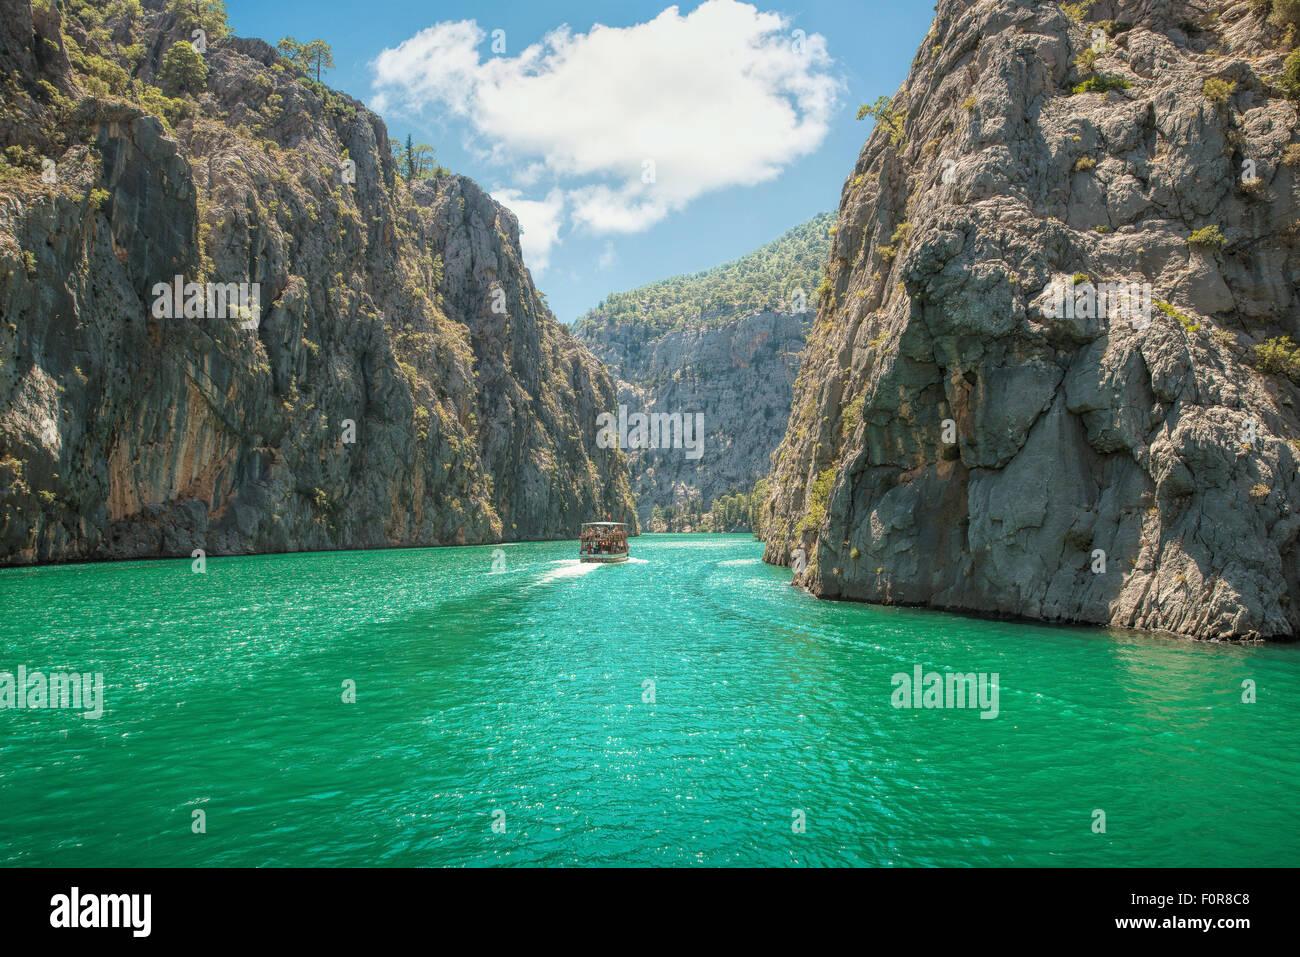 Rocky island green canyon in a mountain lake , Turkey - Stock Image